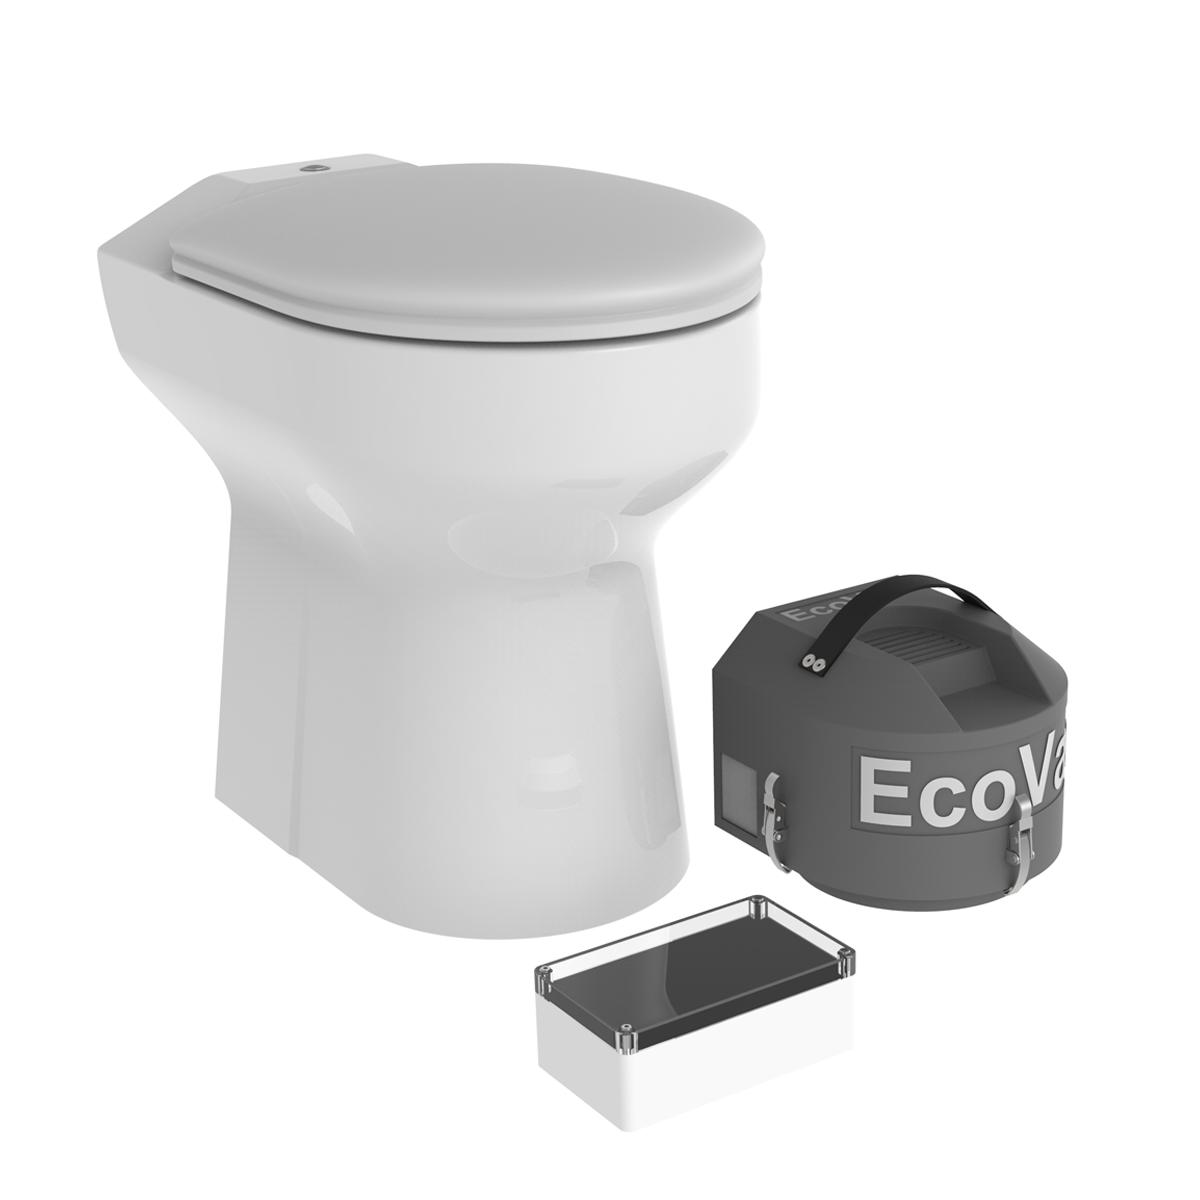 EcoVac™ vacuum toilet - > EcoVac brochure> EcoVac manual> BOSS:2 manual> EcoVac troubleshooting